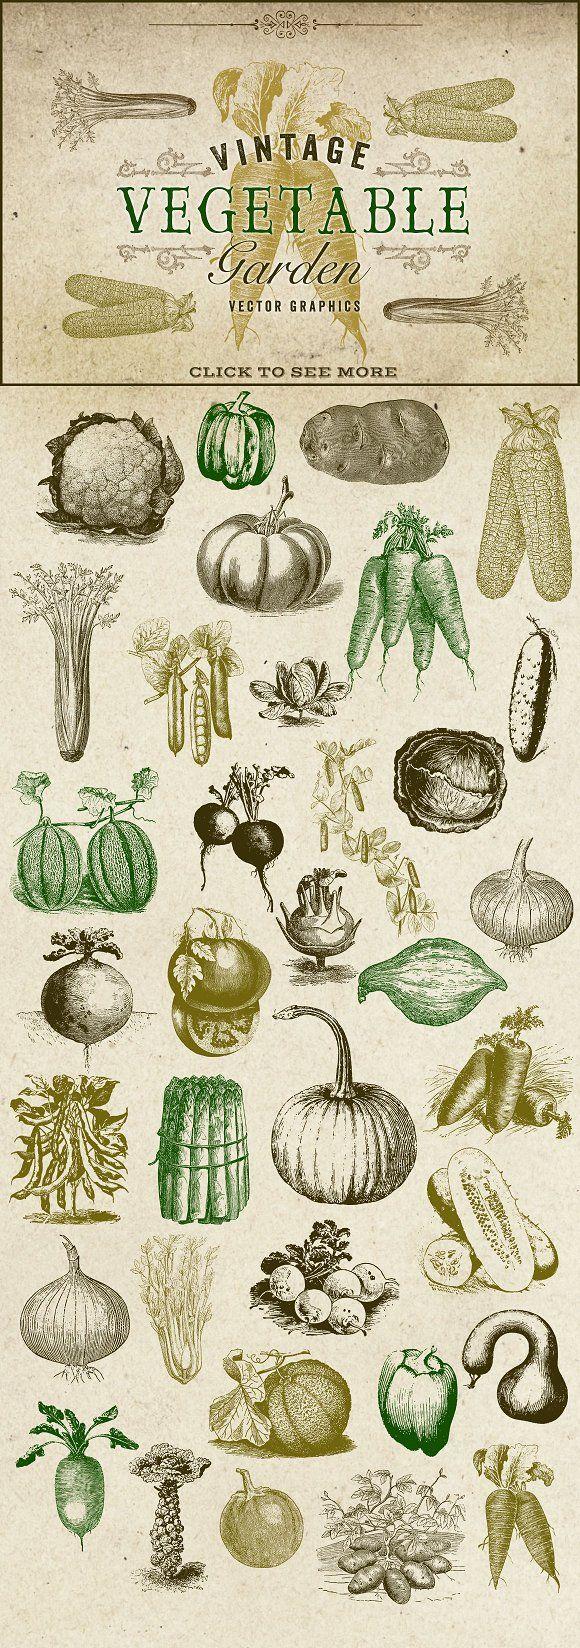 Vintage Vegetable Garden Graphics Vegetable Drawing Vegetable Illustration Vintage Illustration